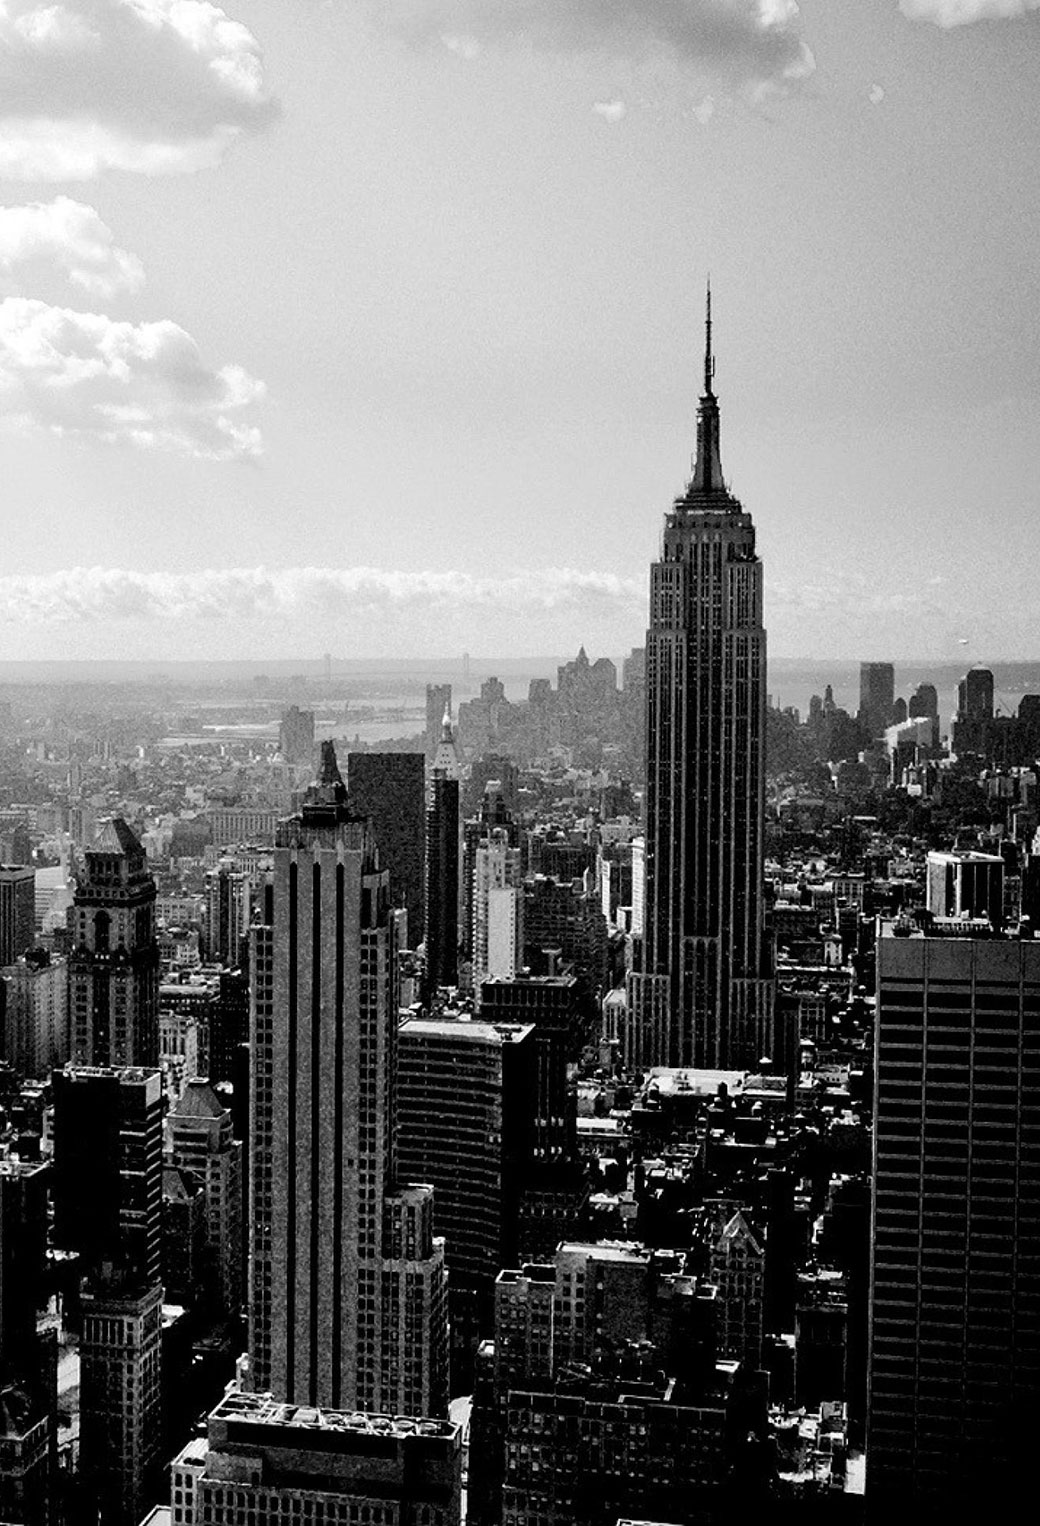 Wallpaper iphone city - New York City 3wallpapers Iphone Parallax Les 3 Wallpapers Iphone Du